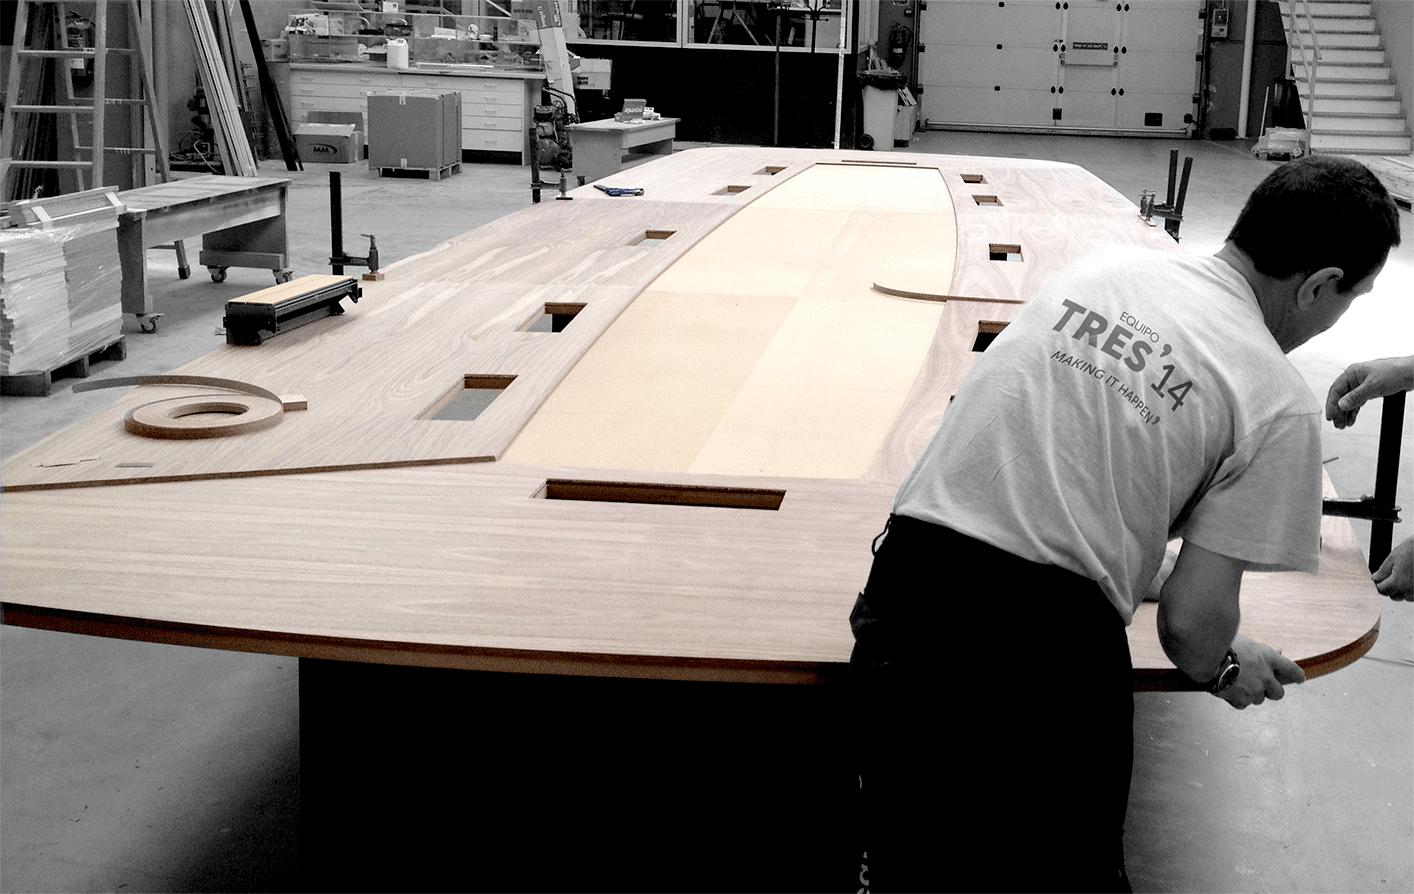 equipotres14 Mobiliario de oficina, mobiliario para empresa, carpinteria, ebanisteria, mobiliario de diseño, mobiliario a medida, muebles a medida 66